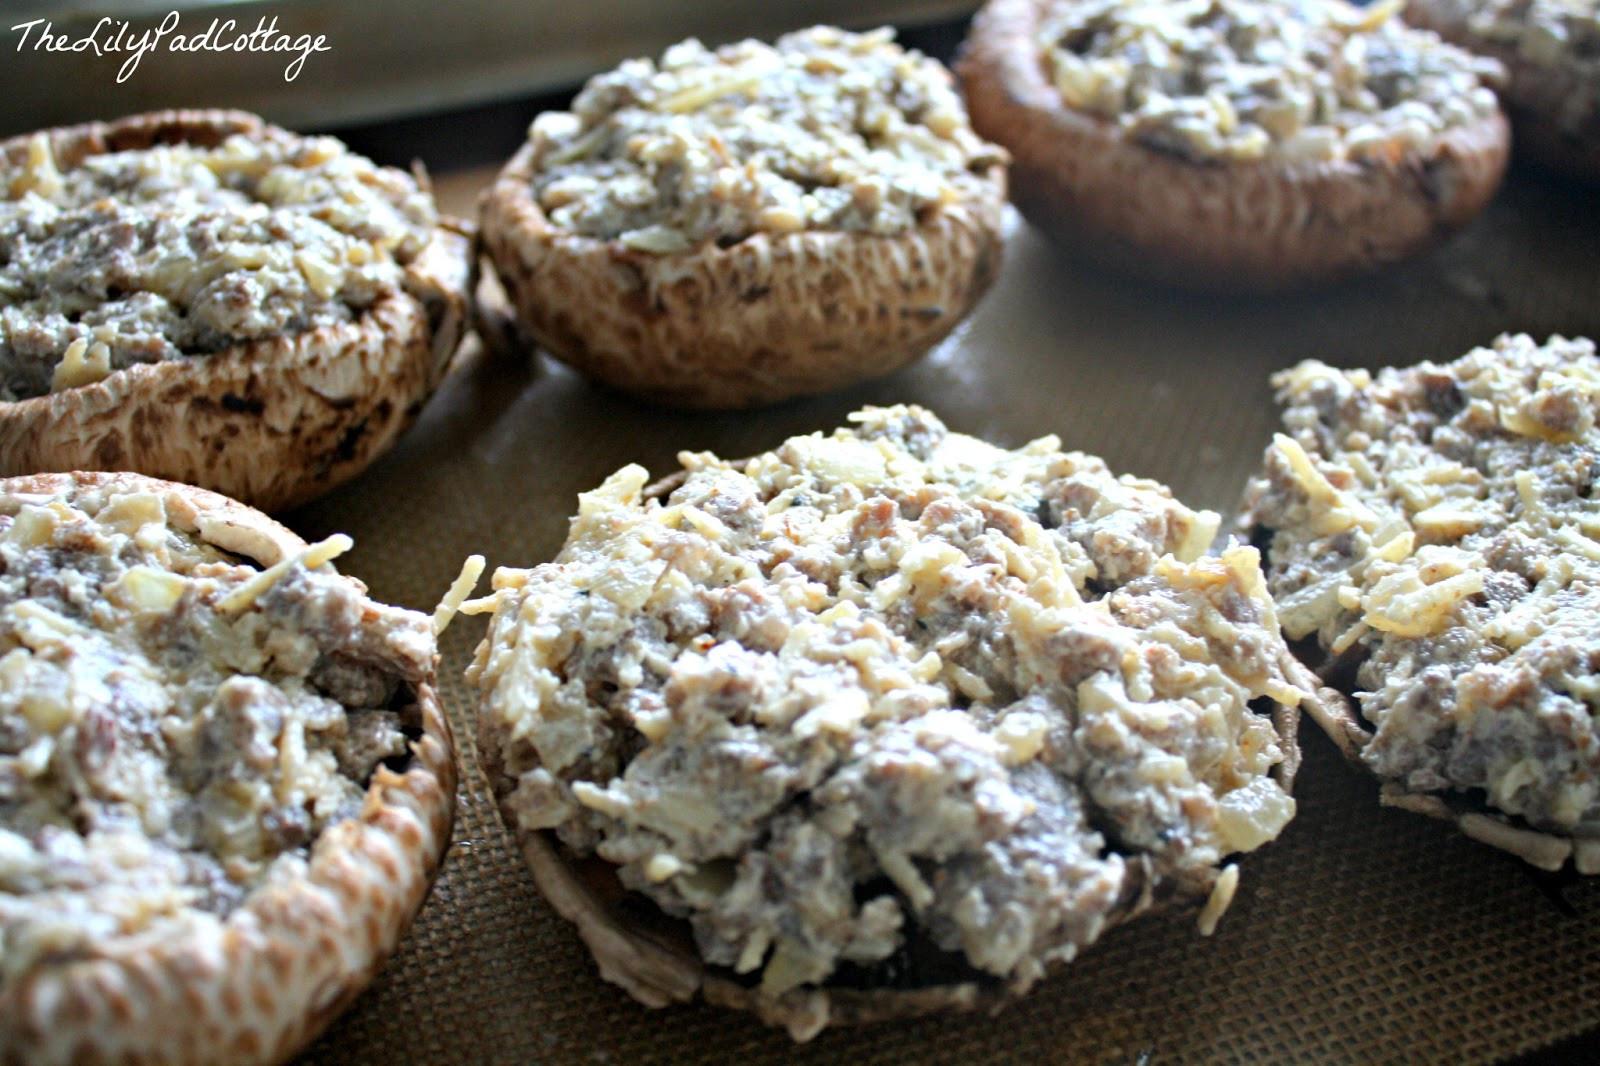 Baby Bella Mushrooms Recipes  Stuffed Baby Bella Mushrooms The Lilypad Cottage